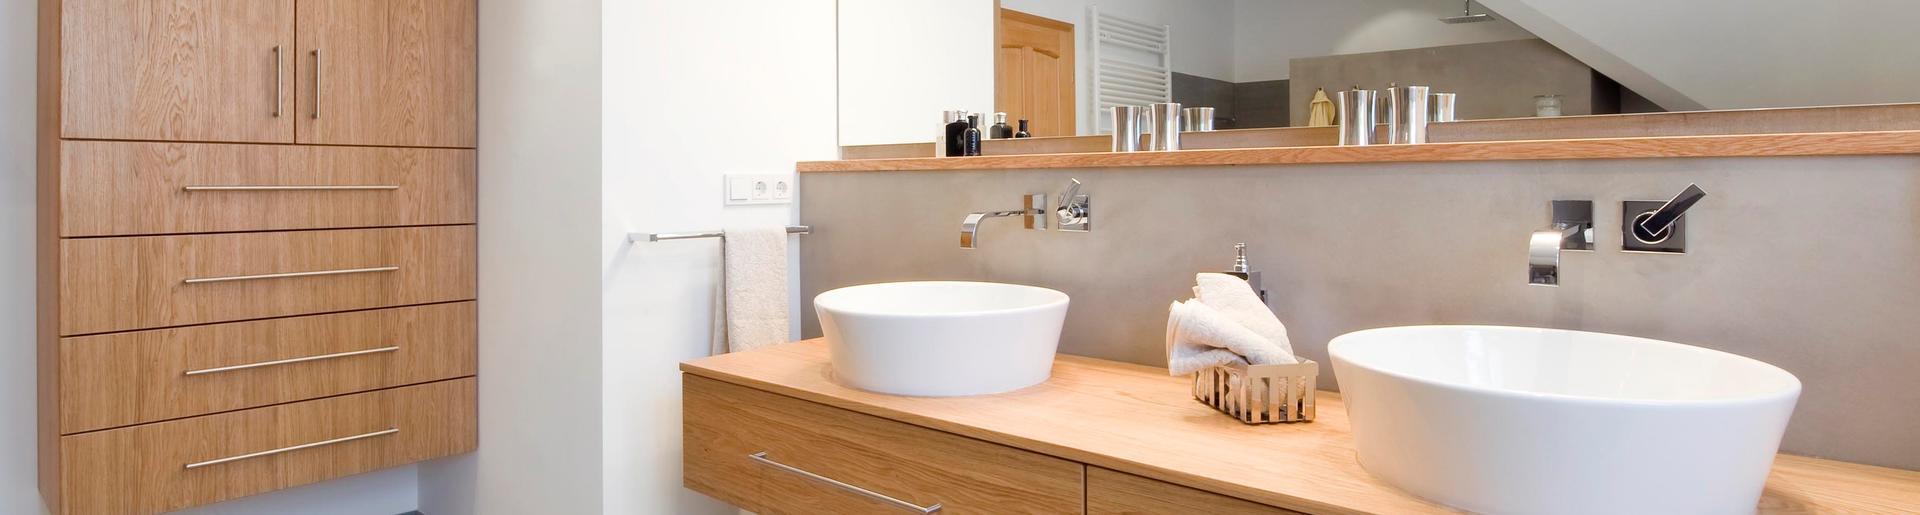 Holz im Badezimmer | Senger | Osnabrück | Gebäudetechnik